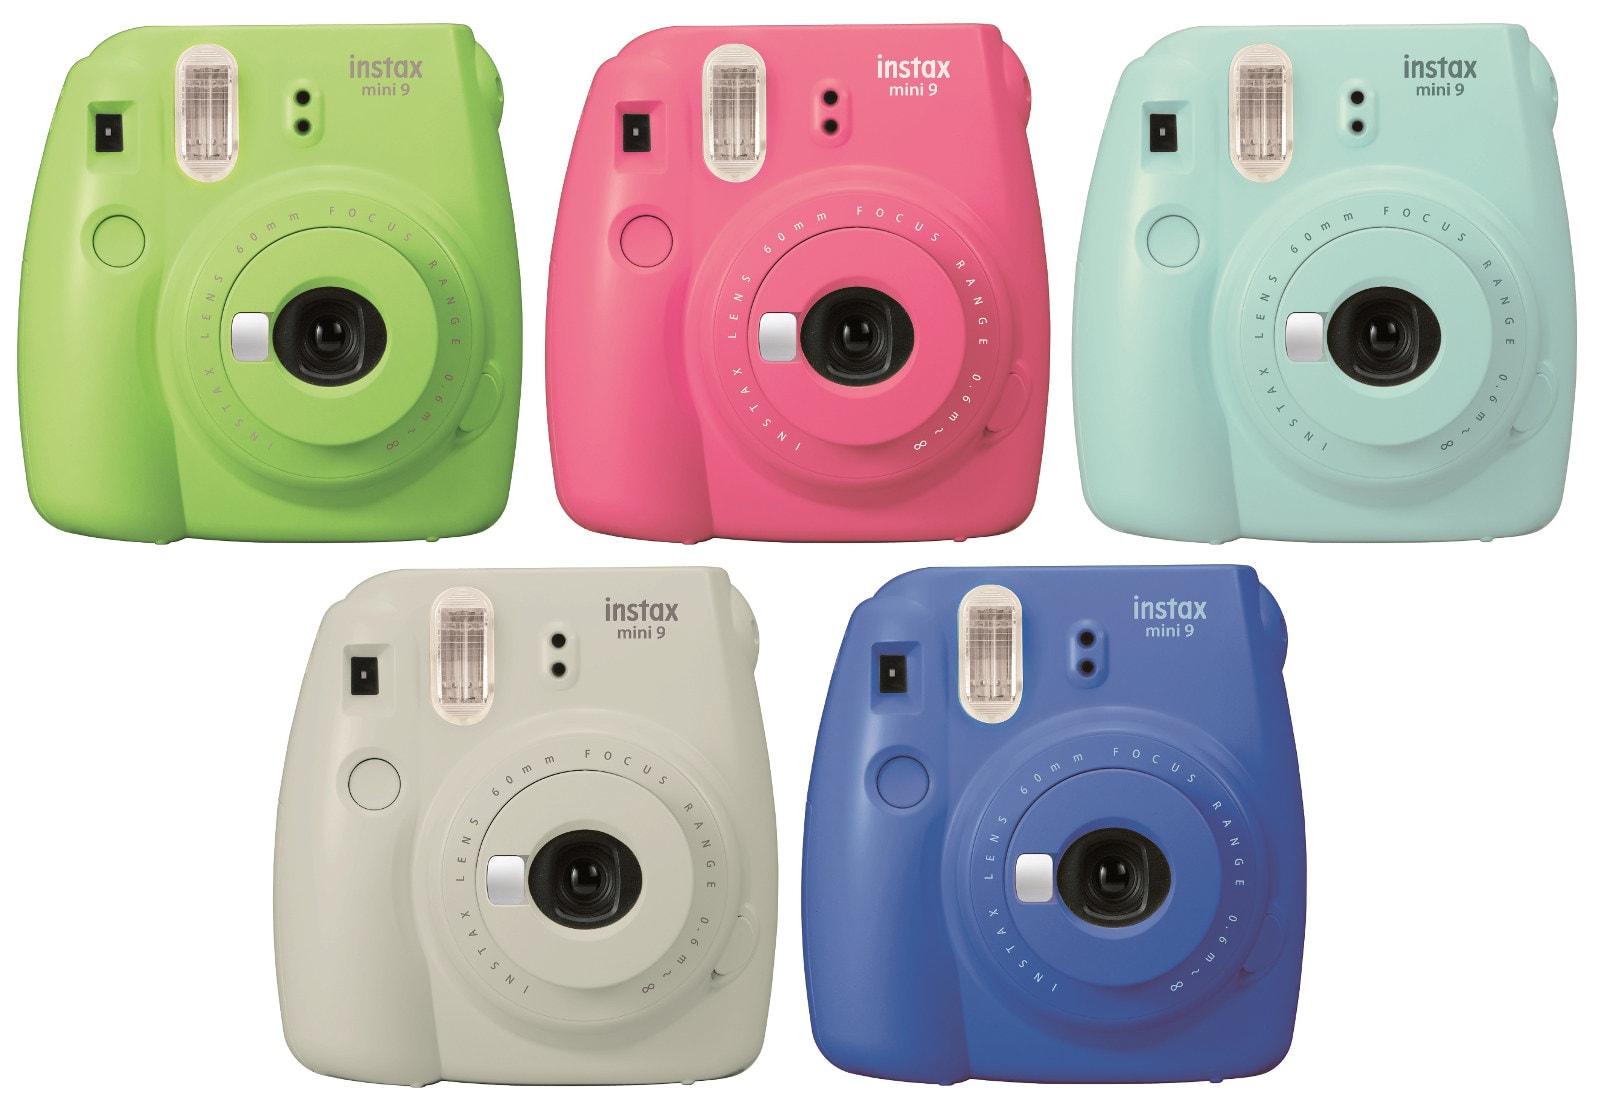 296fb5f93ca1 Fujifilm s Instax Mini 9 is colorful and selfie friendly